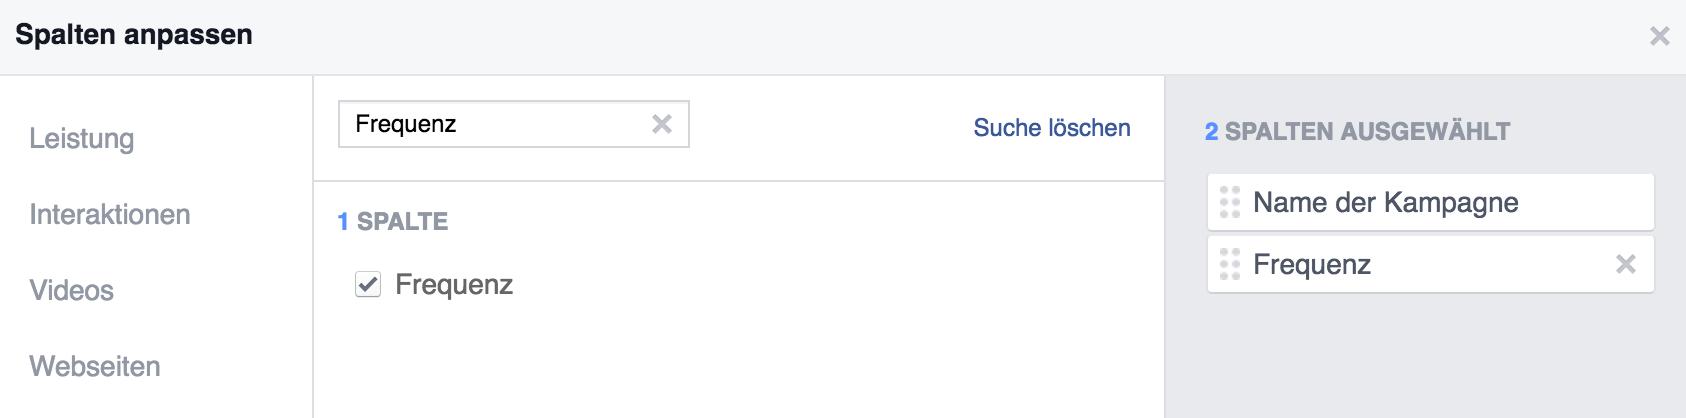 Facebook_Kampagne_optimieren1